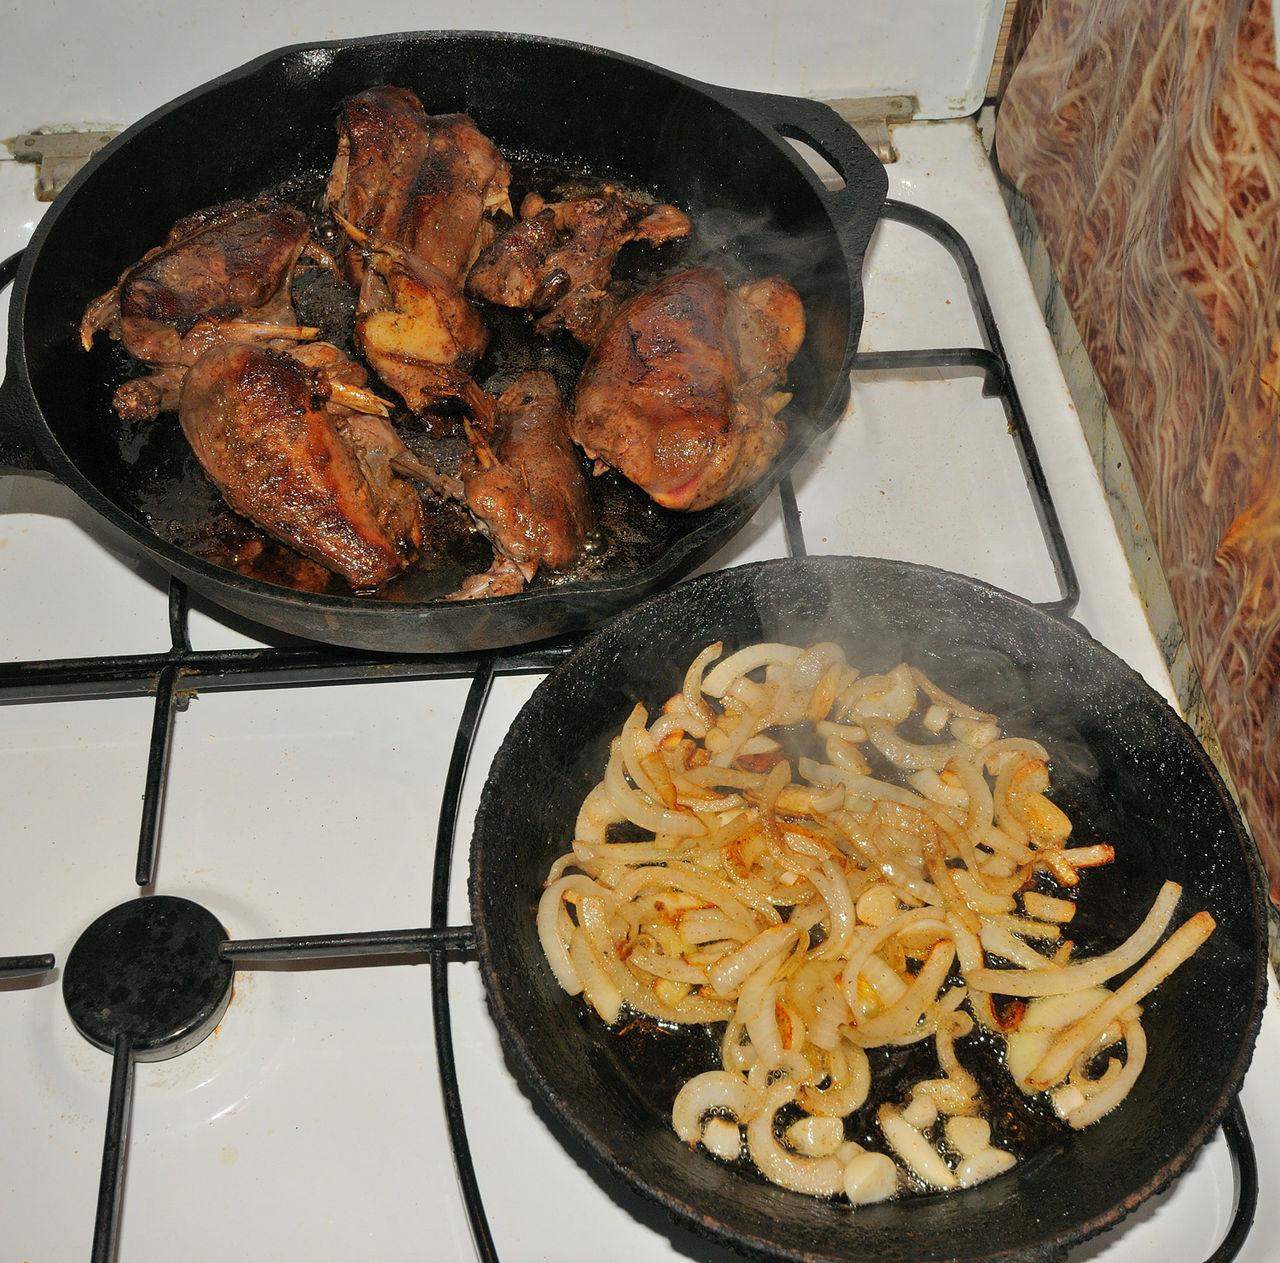 Рецепт шулюма говядины на костре